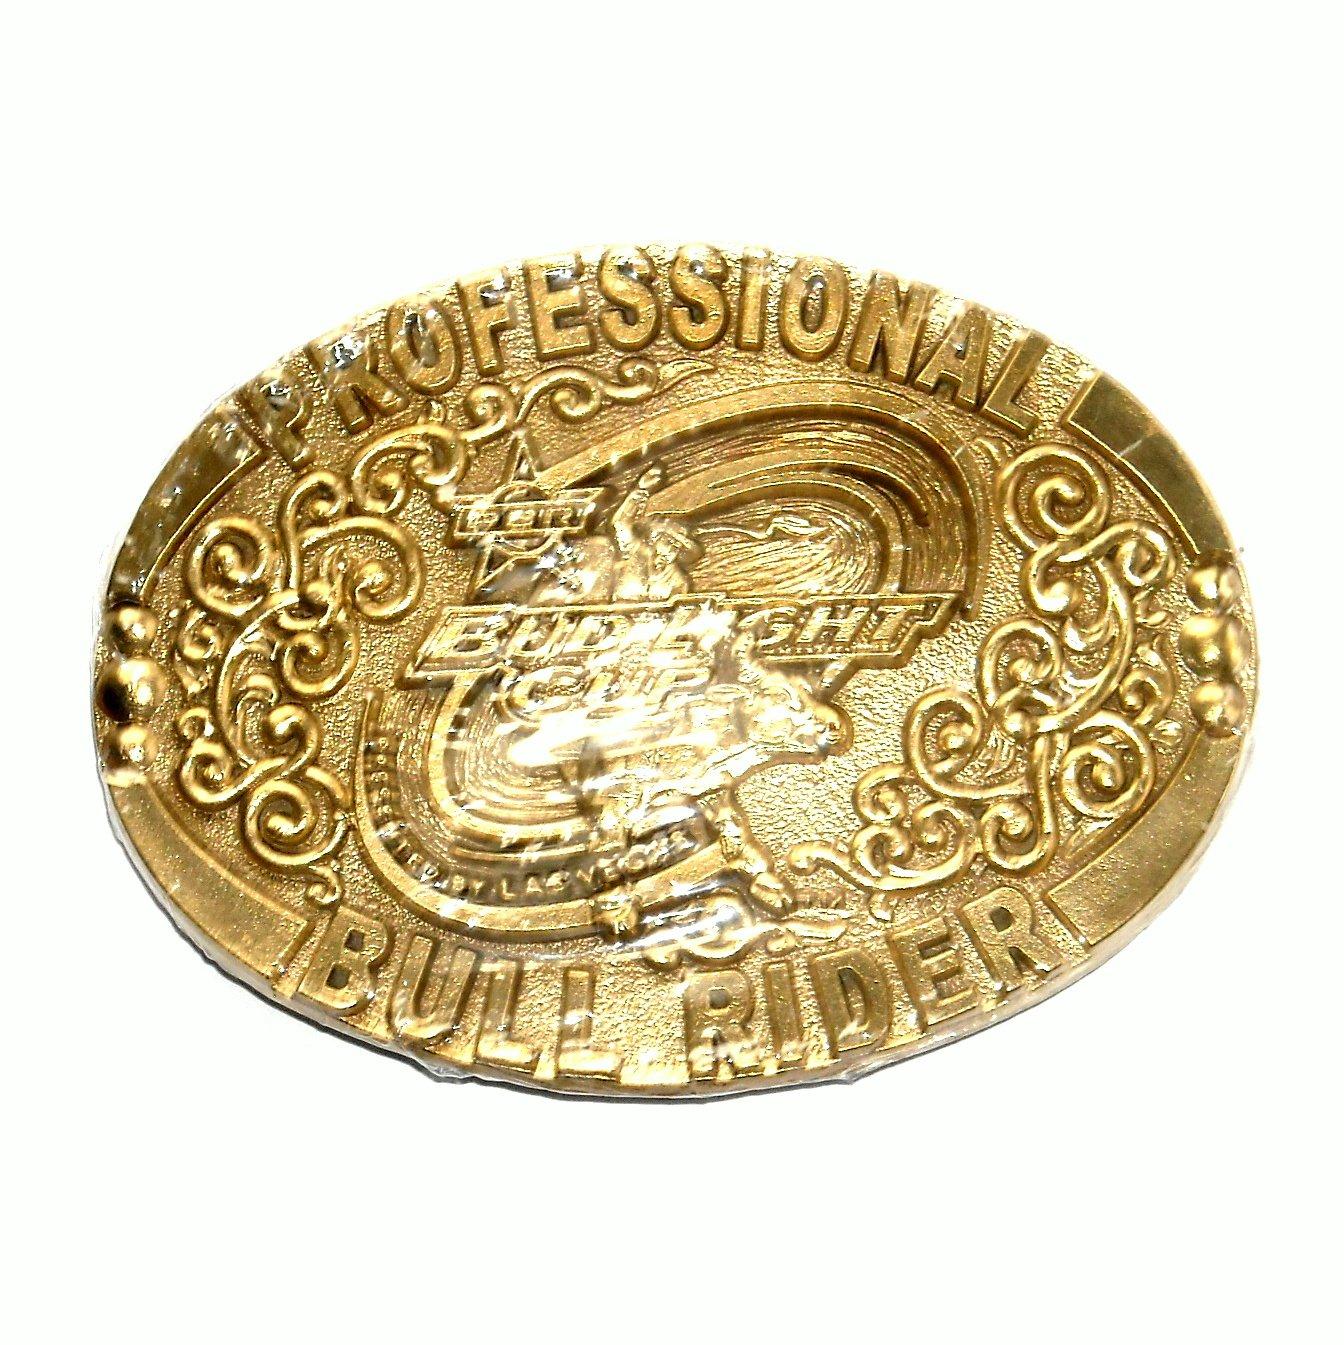 Professional Bull Rider ADM Solid Brass Belt Buckle